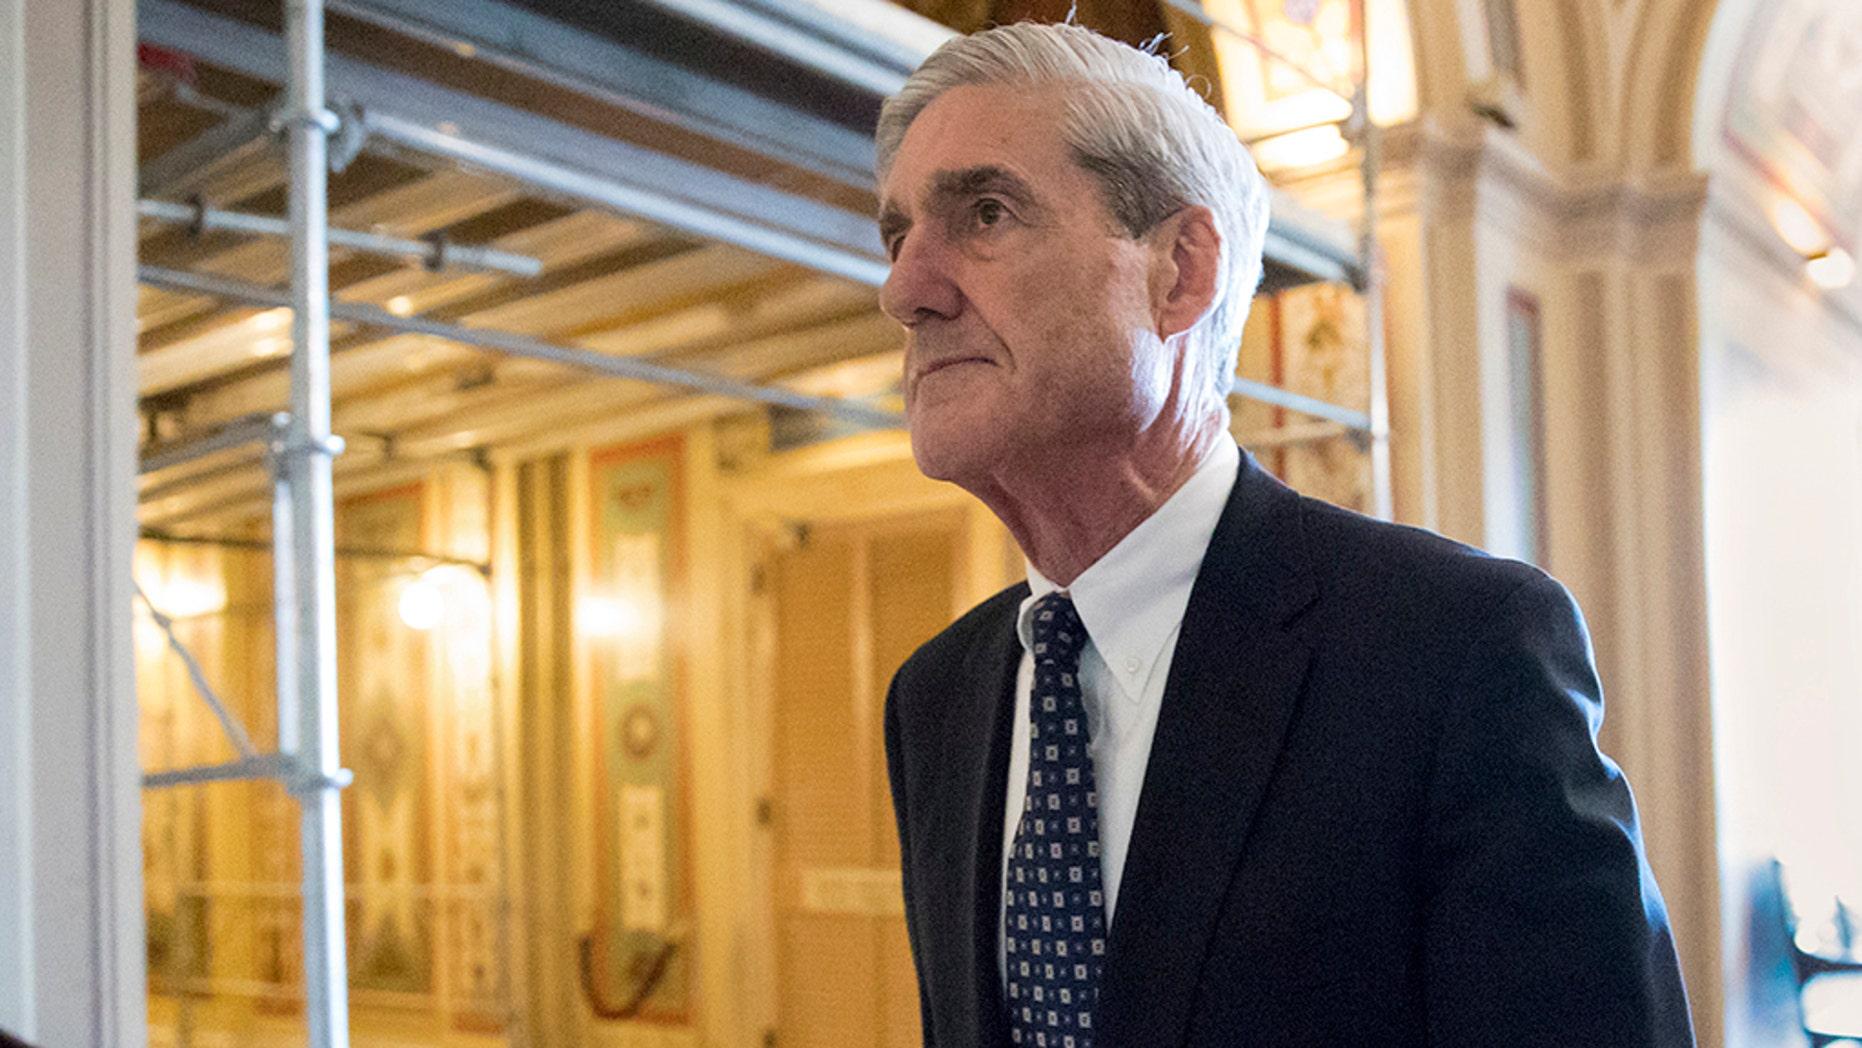 Special Counsel Robert Mueller. (AP Photo/J. Scott Applewhite, File)